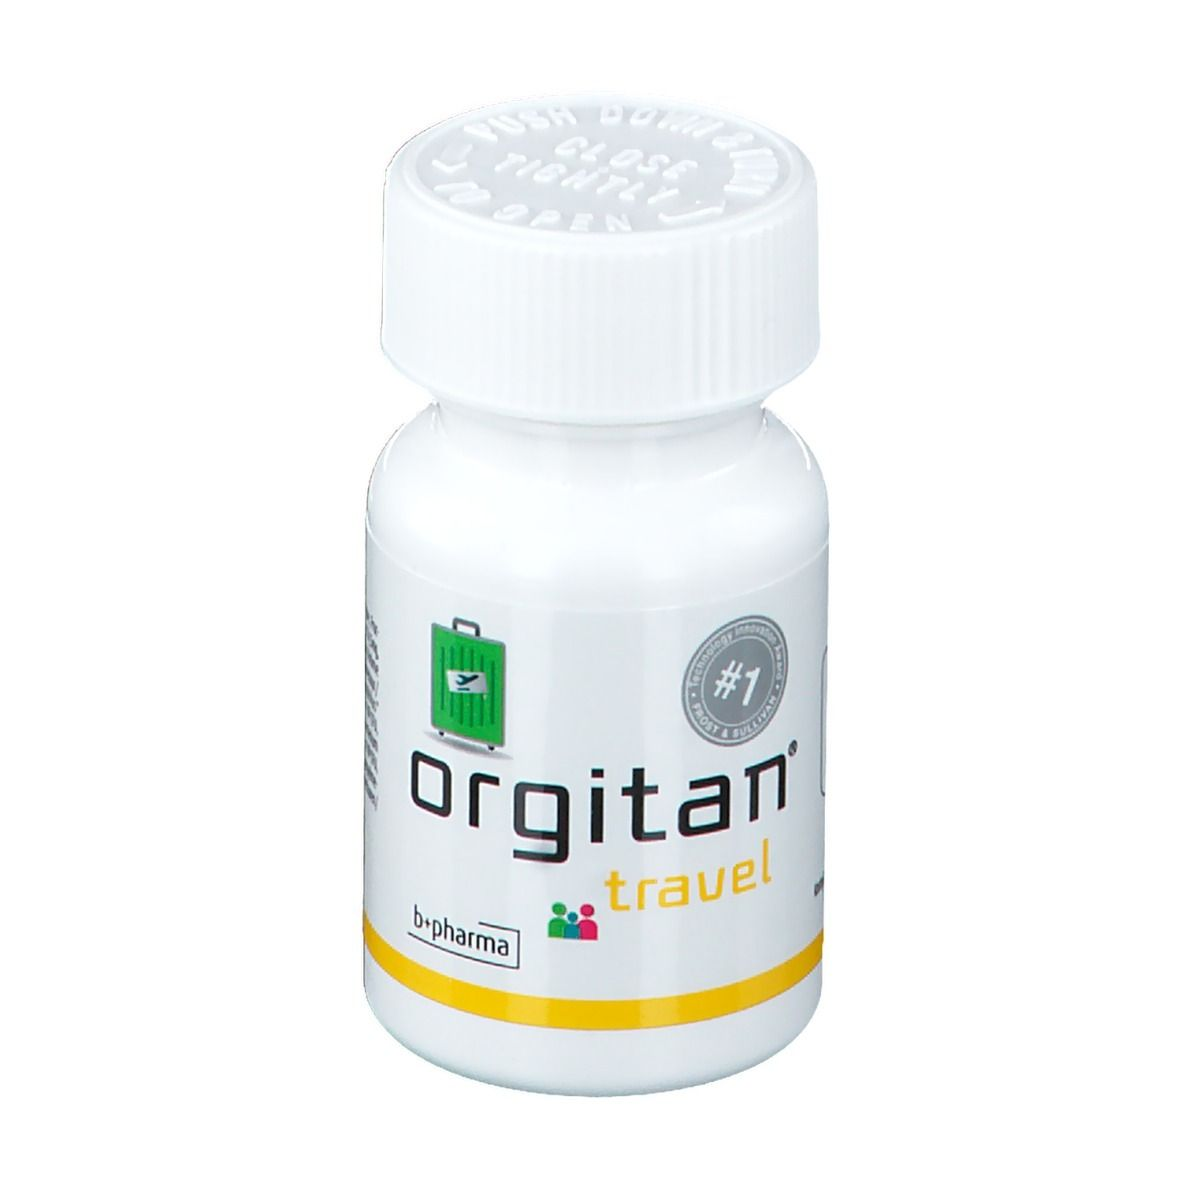 Image of Orgitan Travel